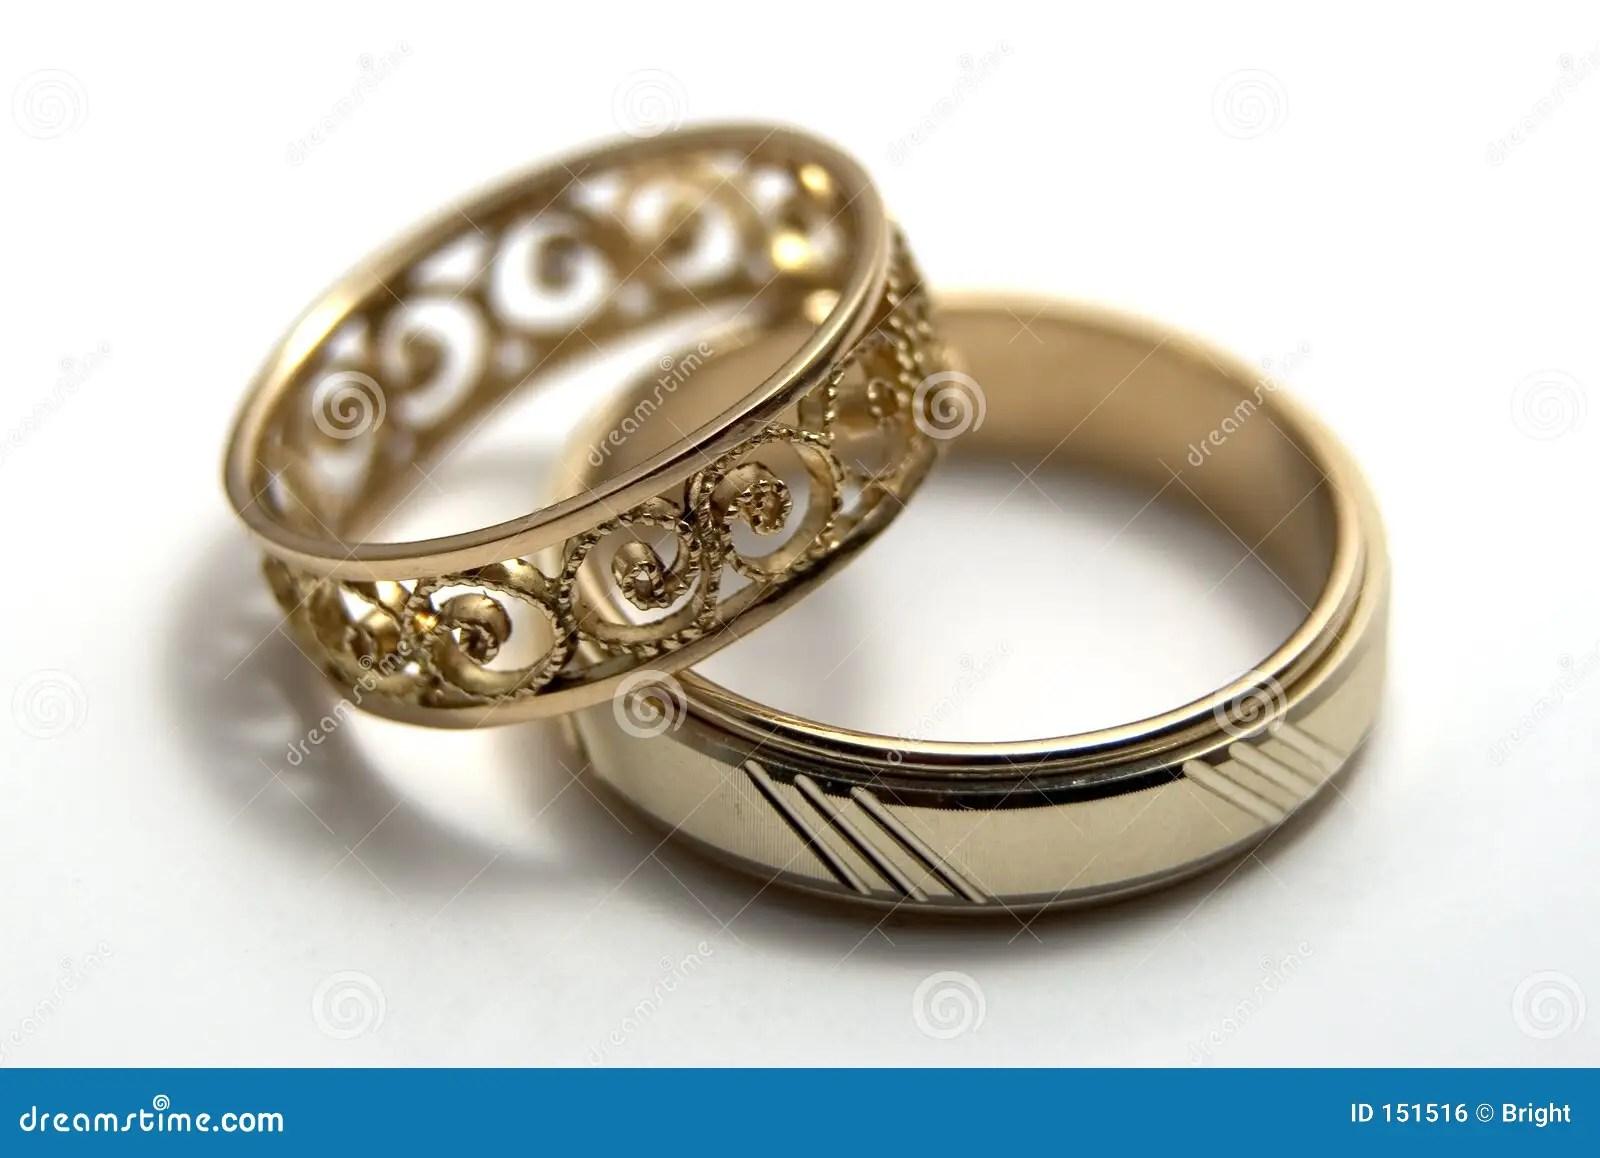 wedding rings wedding rings pictures Wedding rings Royalty Free Stock Image